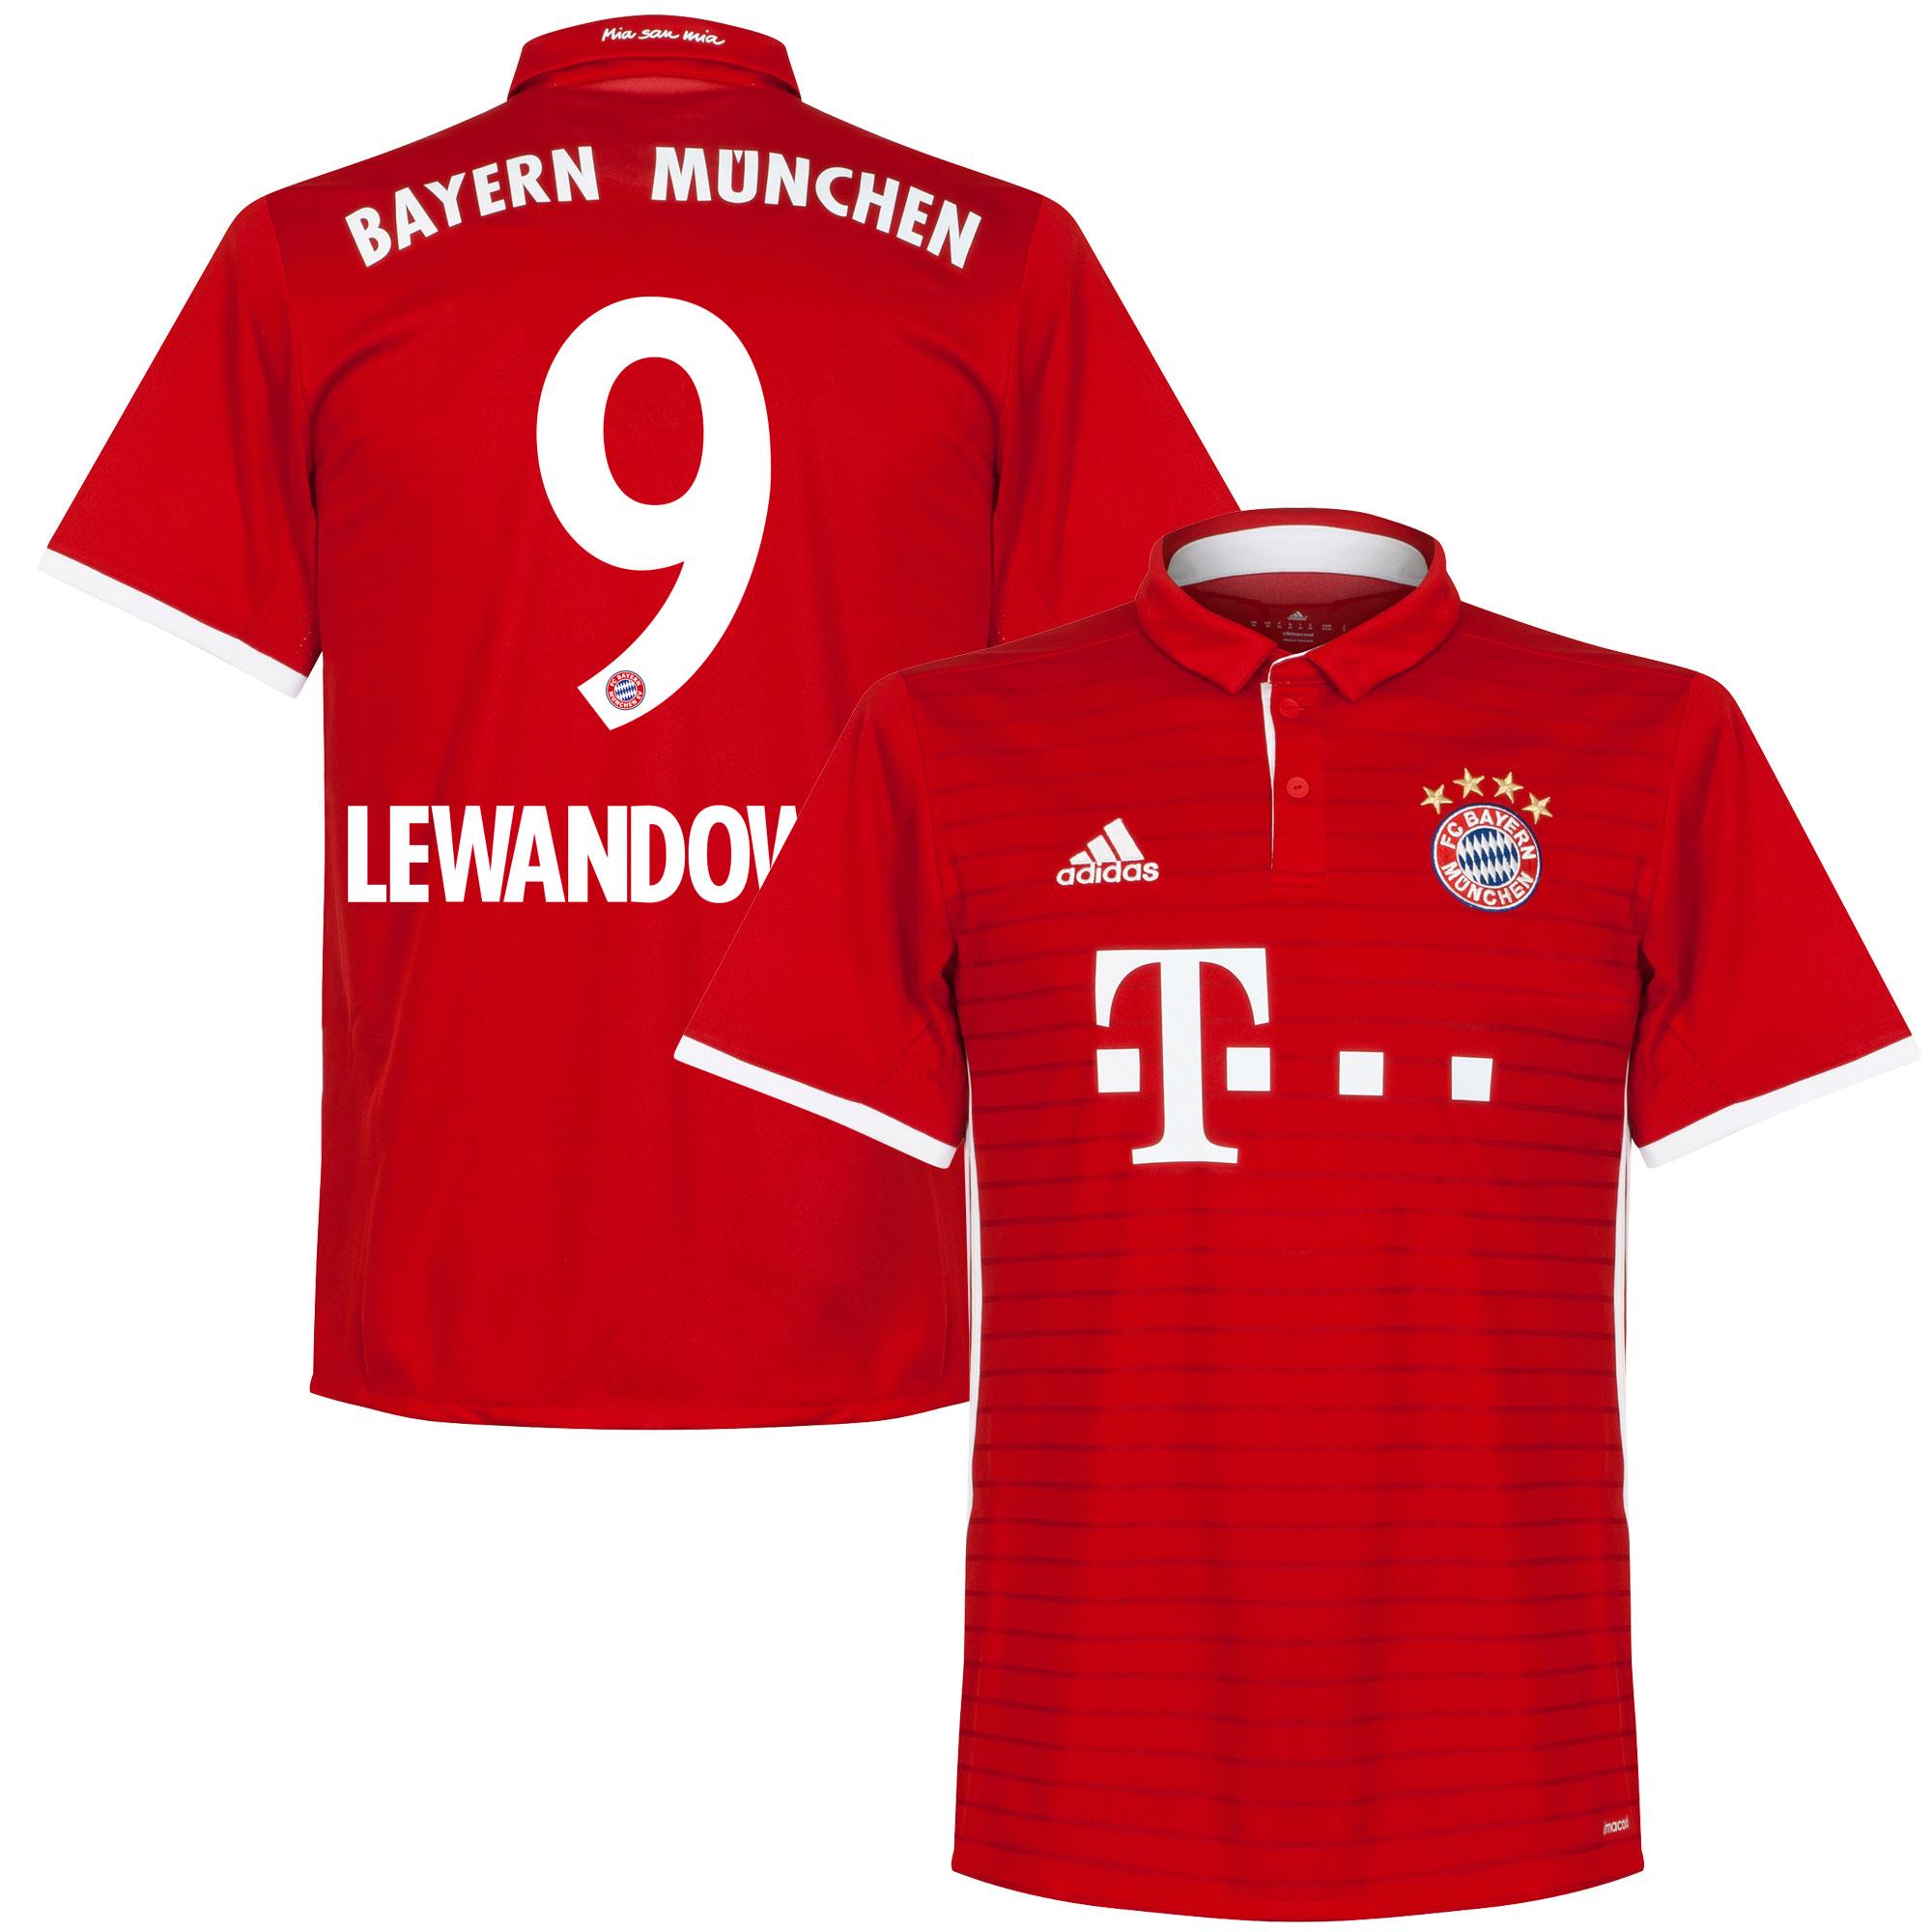 Bayern Munich Home Lewandowski Jersey 2016 / 2017 - 46